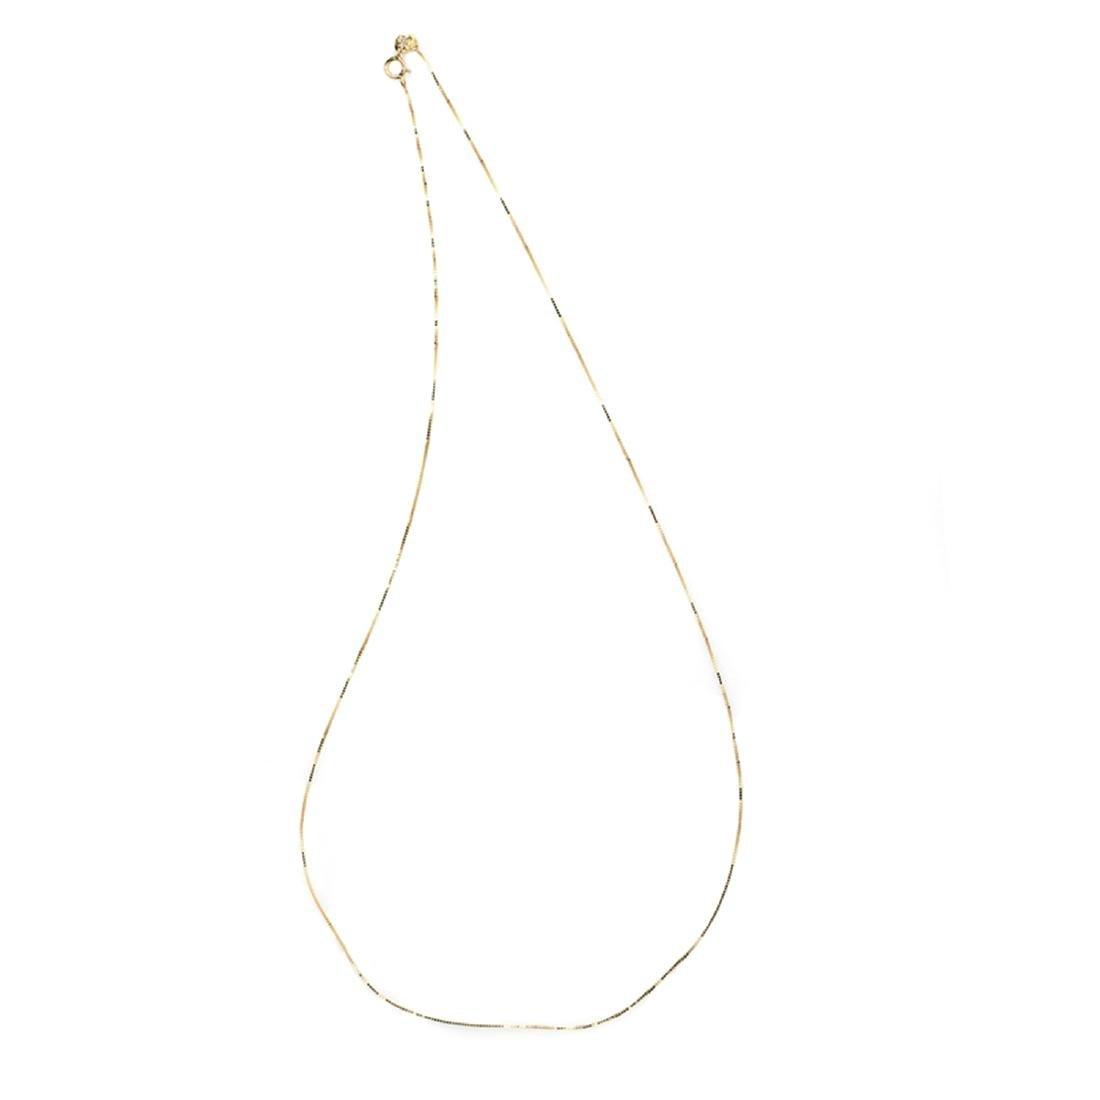 *Fine Jewelry 14KT Gold, 1.0GM, 18'' Chain (GL Neck